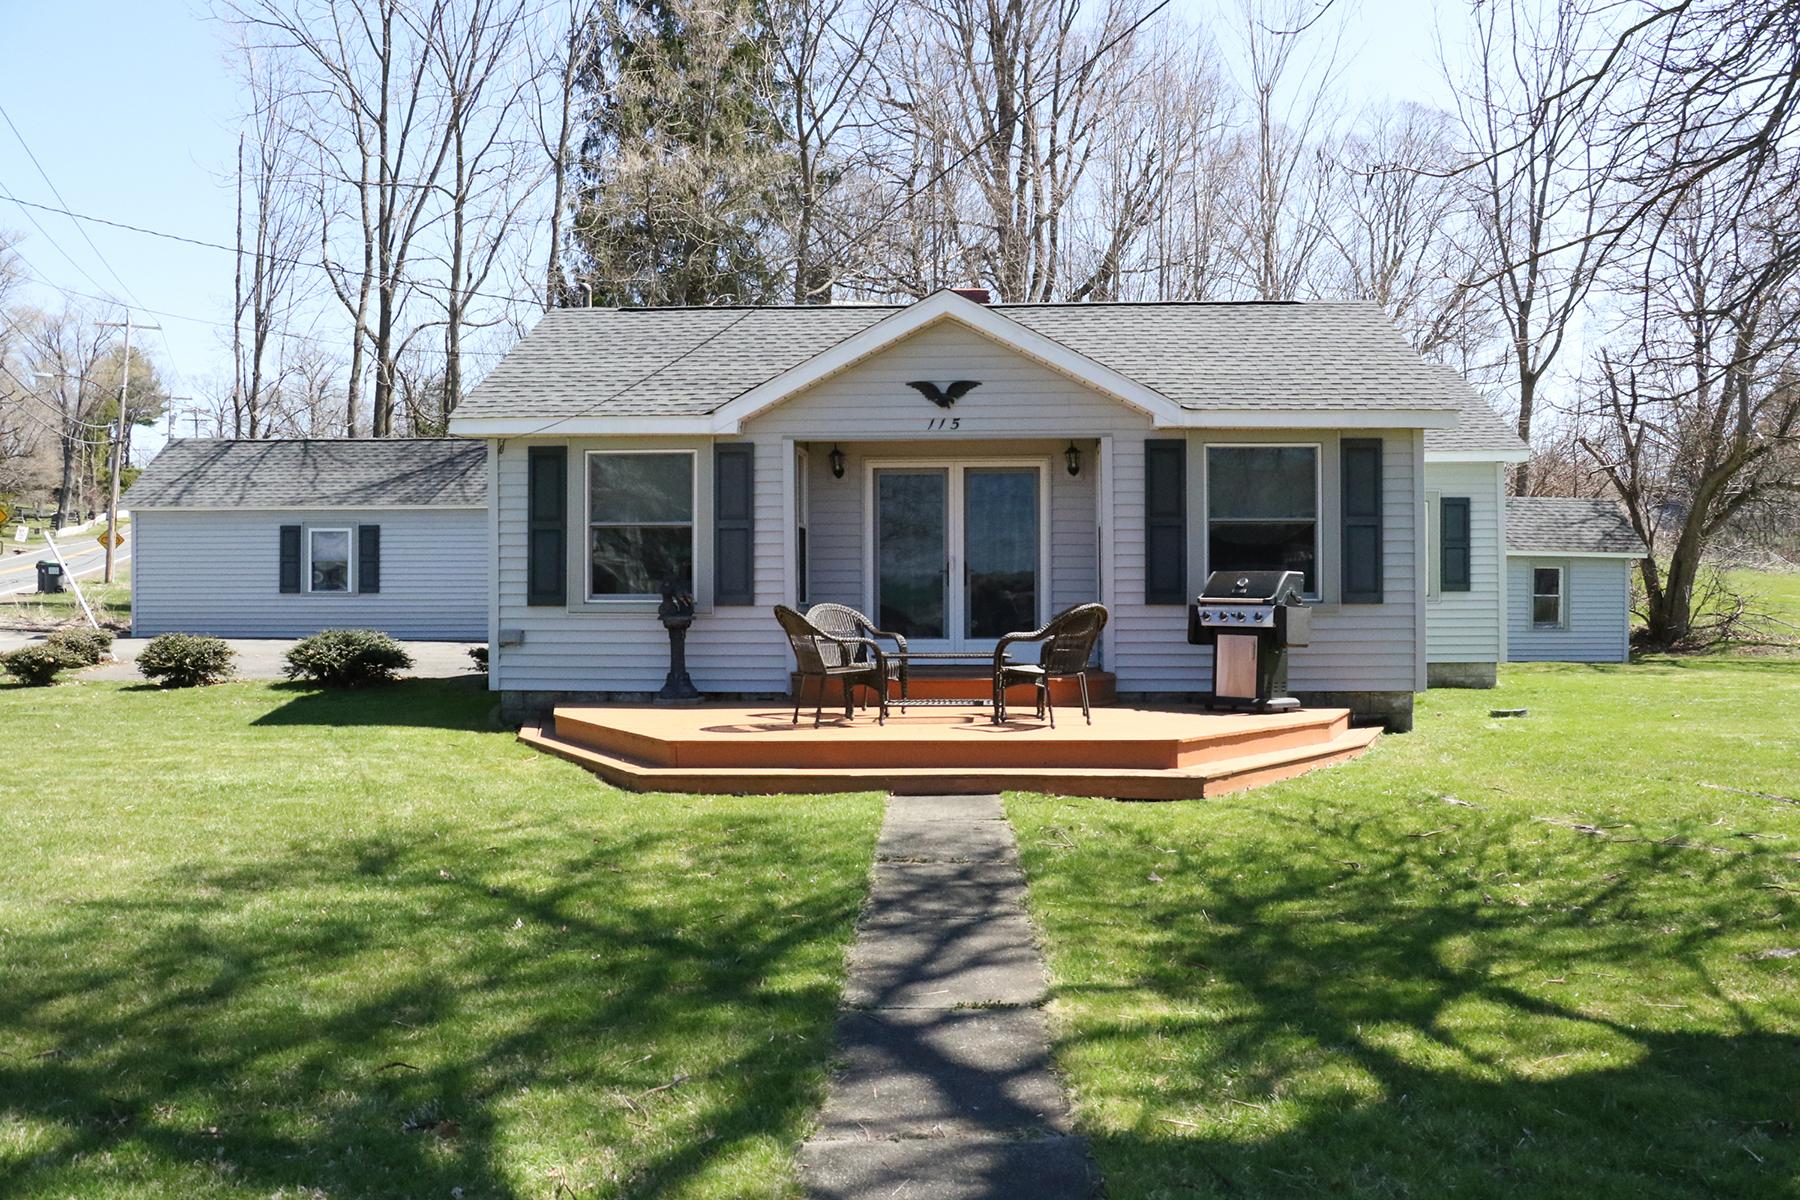 独户住宅 为 销售 在 Hamlet of Livingston 115 County Route 19 Rd Livingston, 纽约州 12541 美国